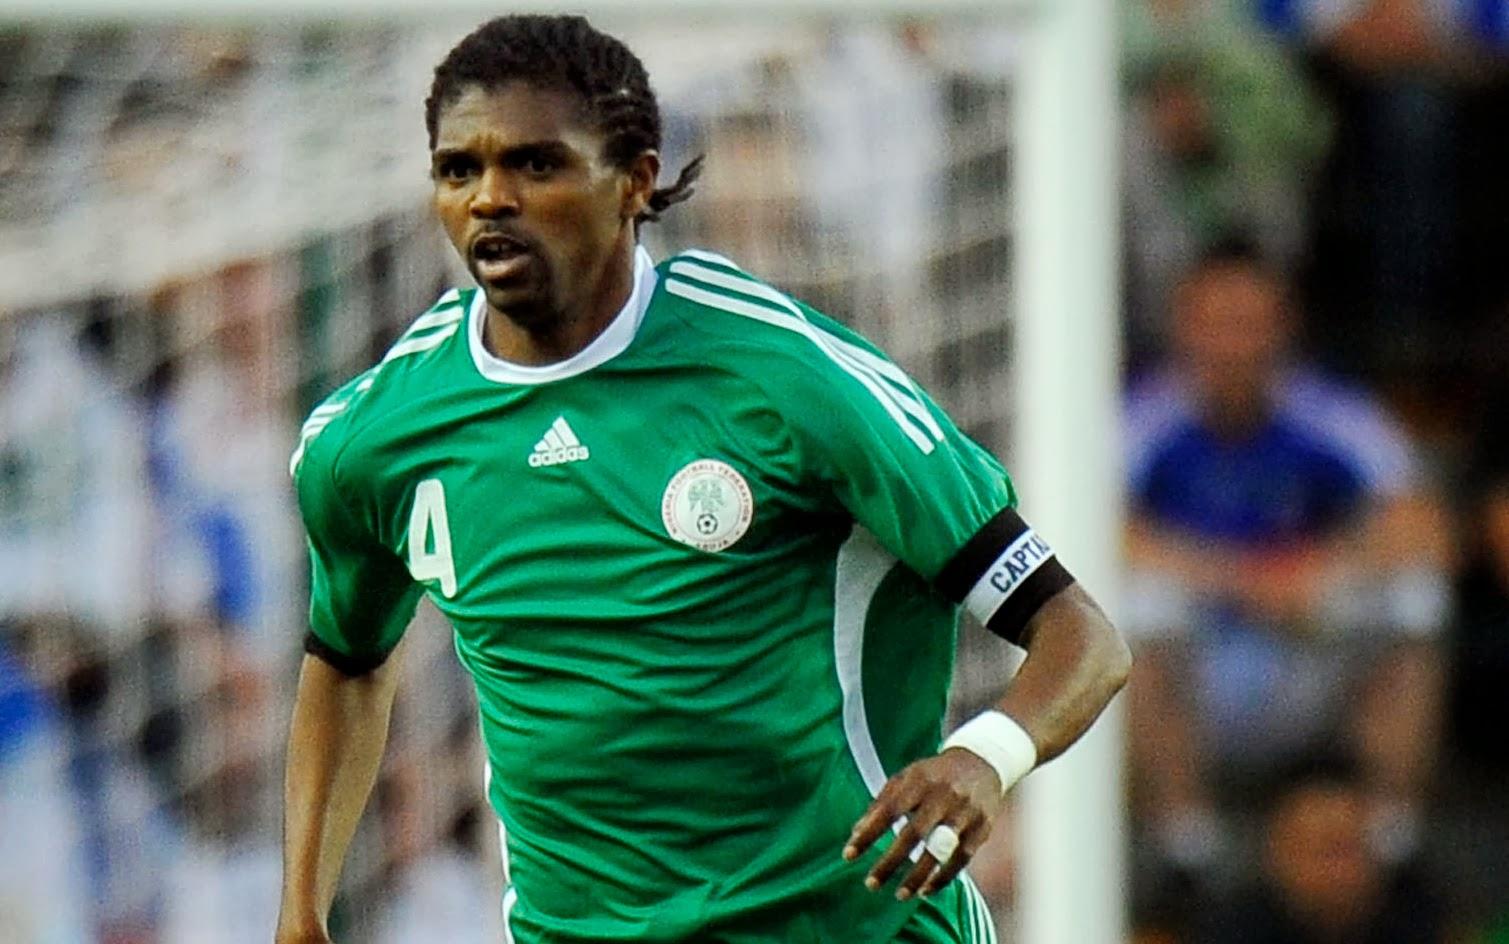 Ex-Super Eagles ace Nwankwo Kanu joins Nigeria presidential race